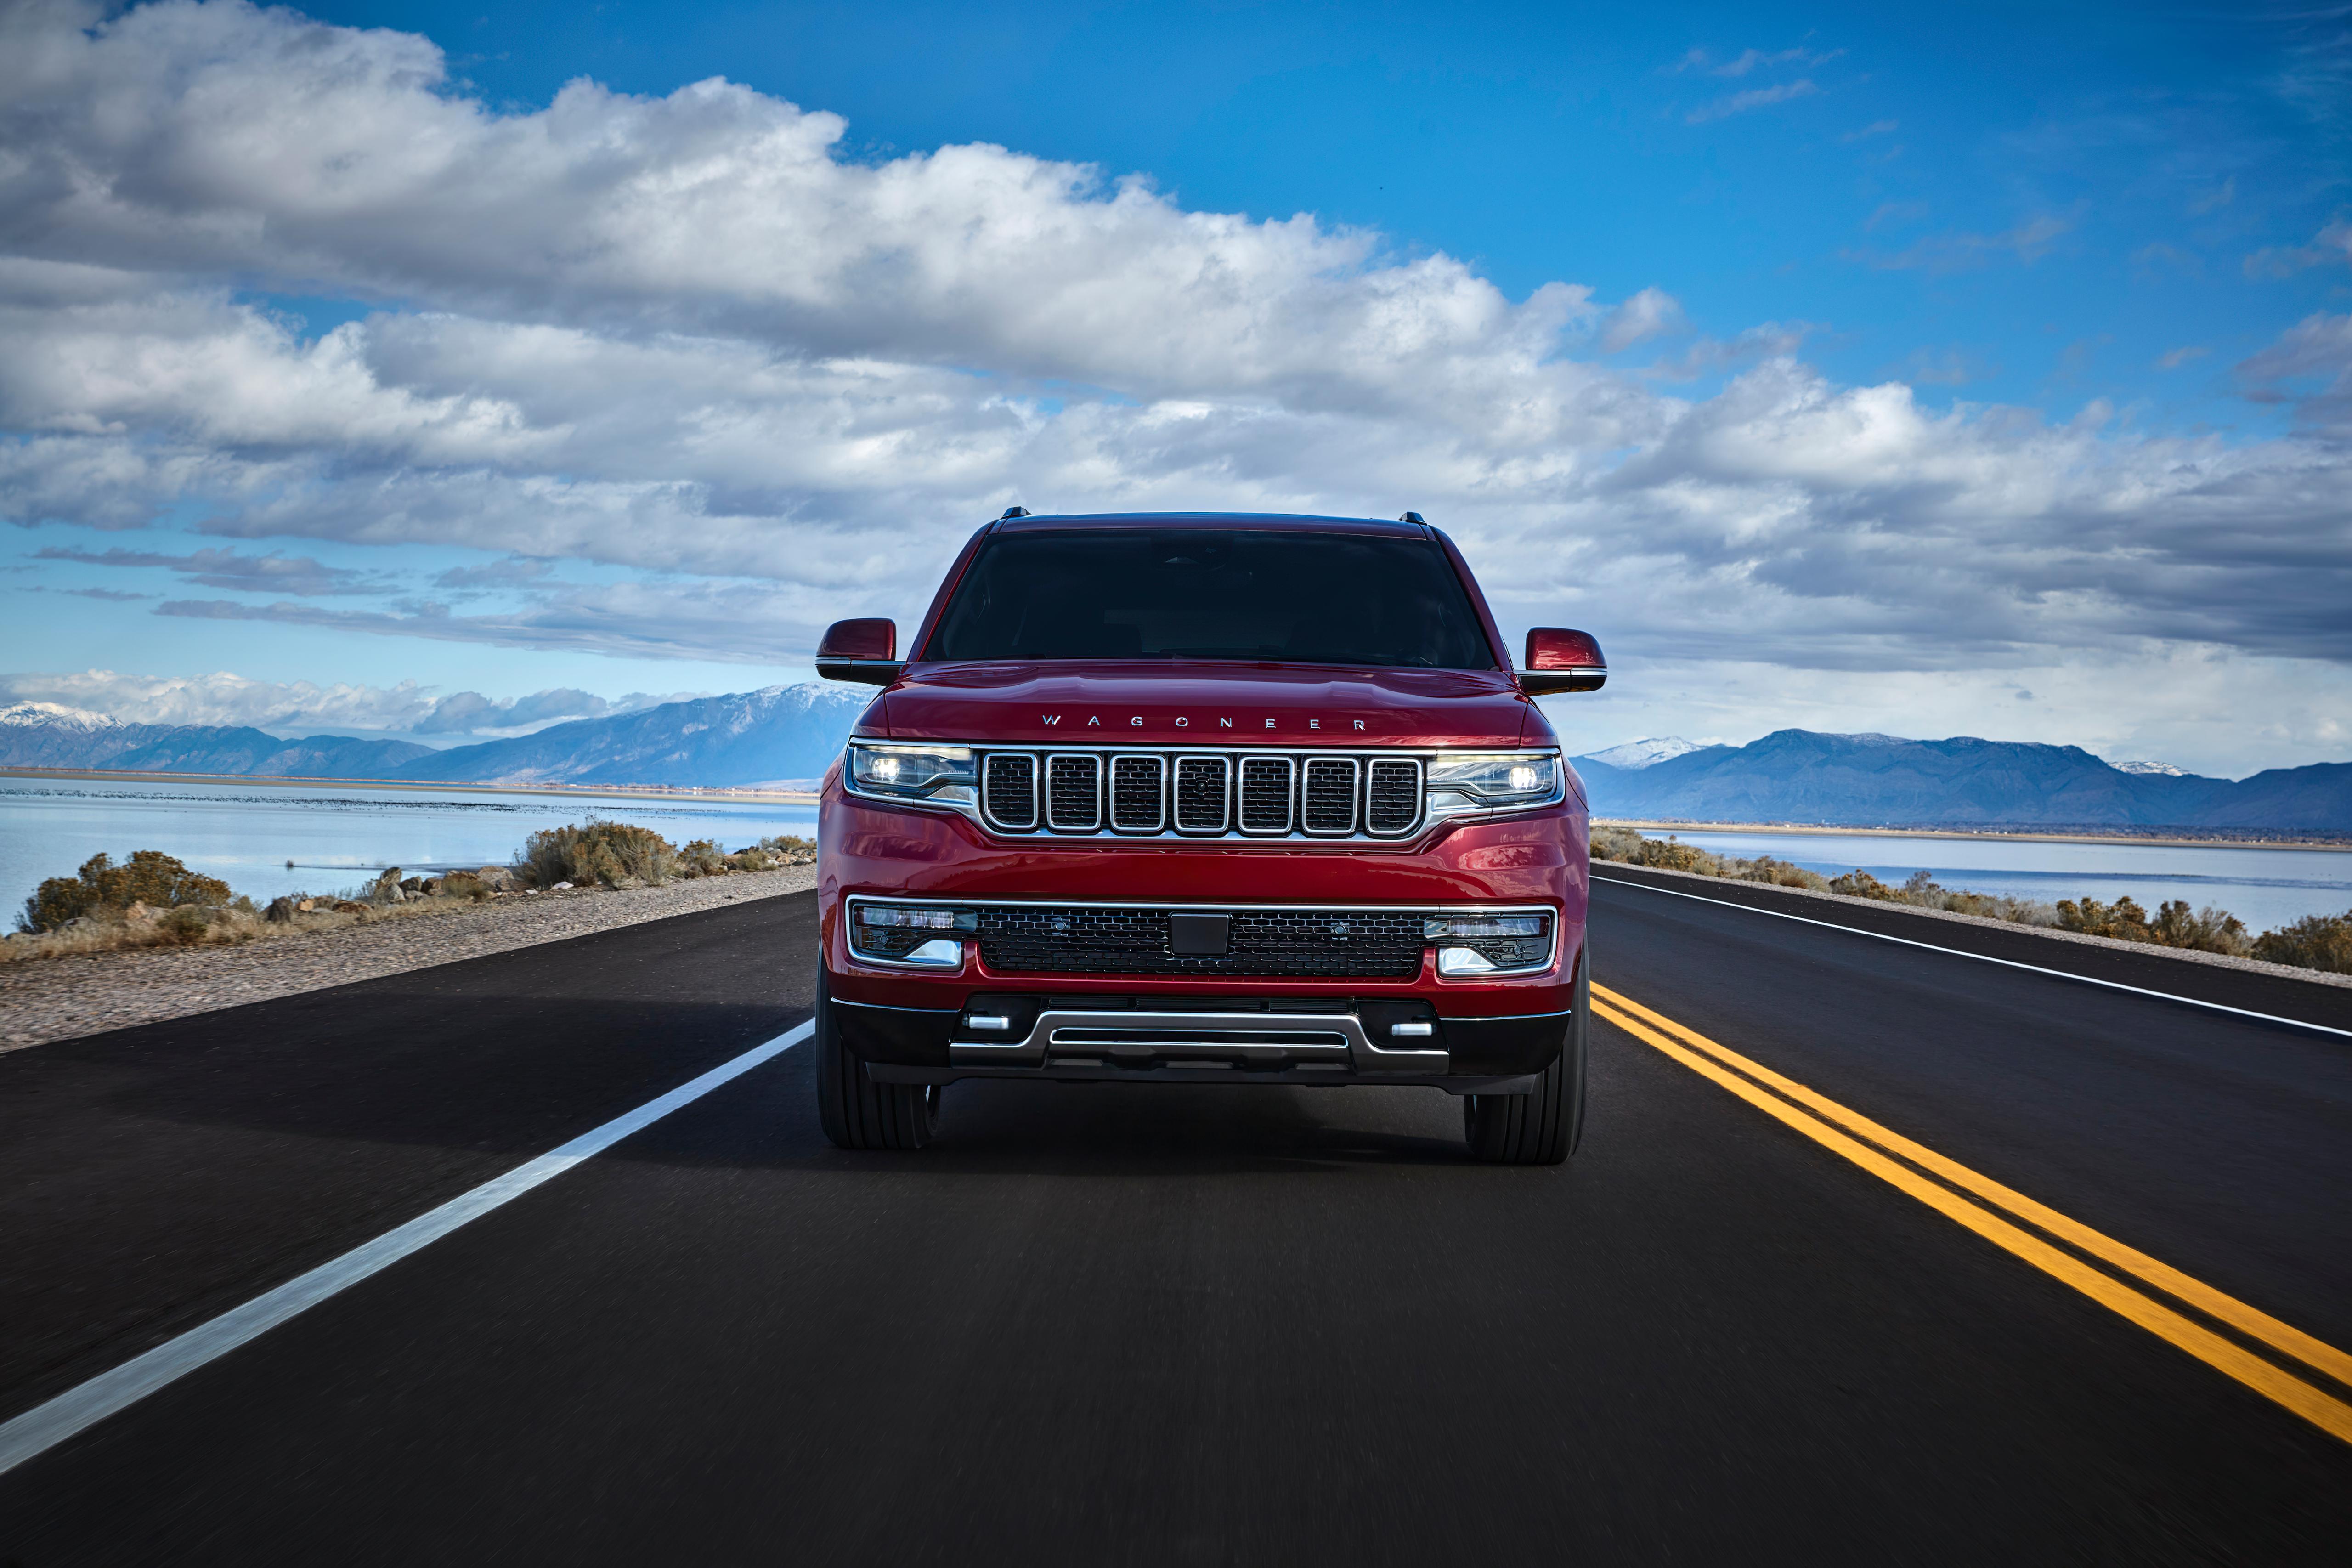 2022 jeep grand wagoneer series iii 4k 1618922966 1 - 2022 Jeep Grand Wagoneer Series III 4k - 2022 Jeep Grand Wagoneer Series III 4k wallpapers